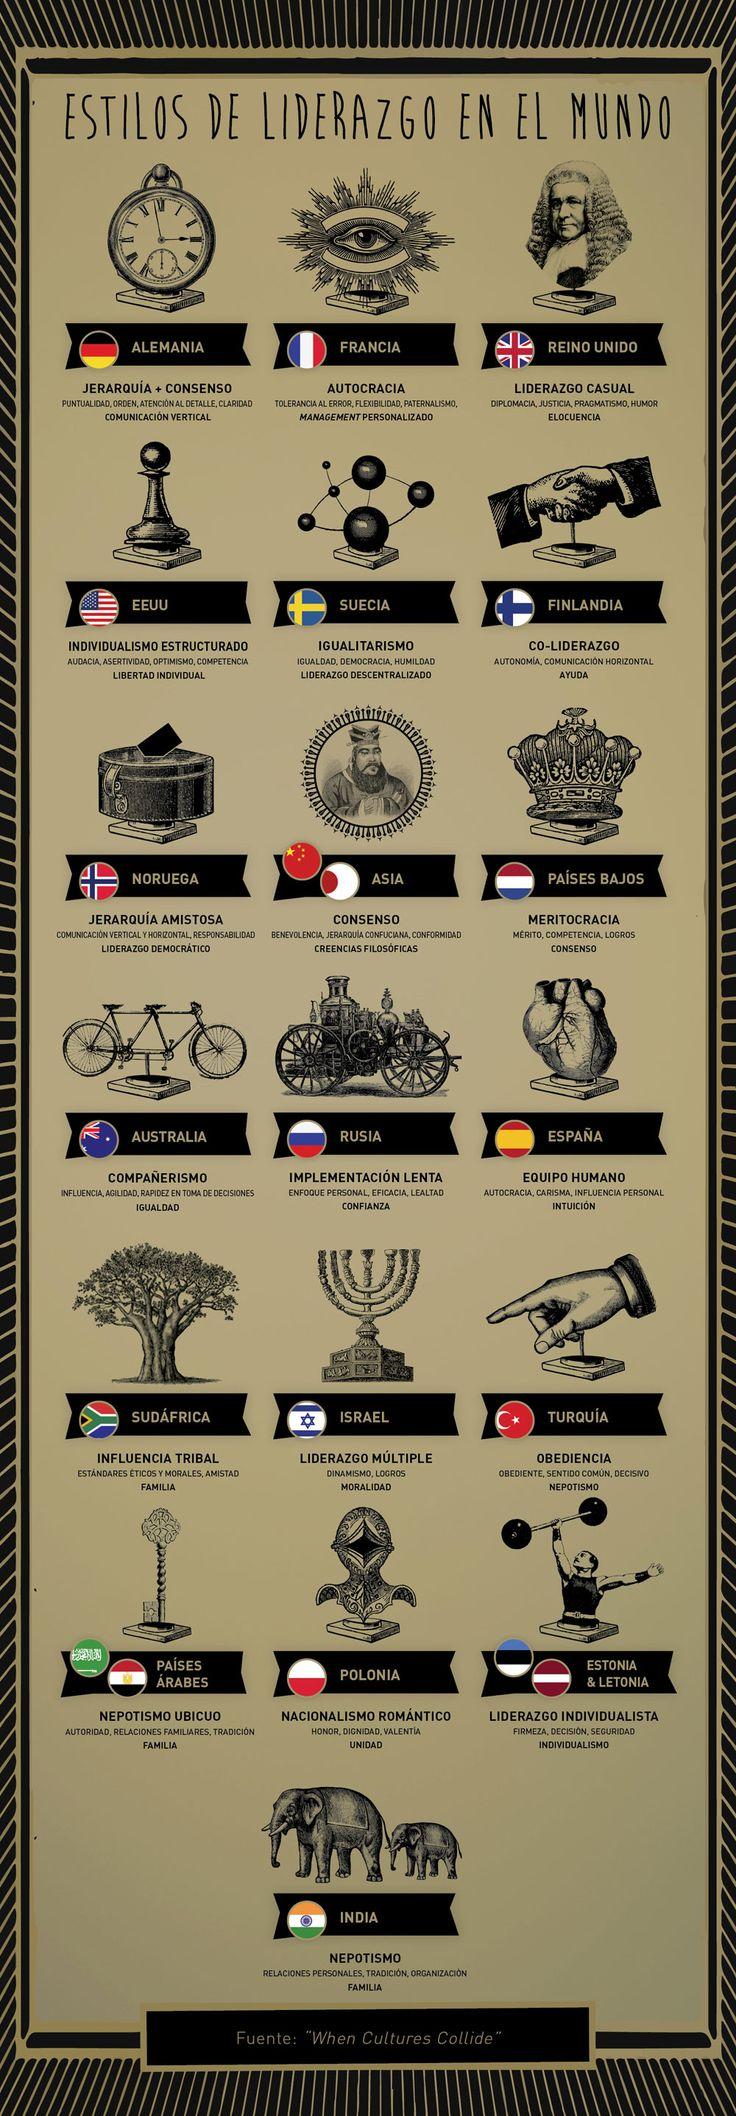 20 estilos de liderazgo en el Mundo #infografia